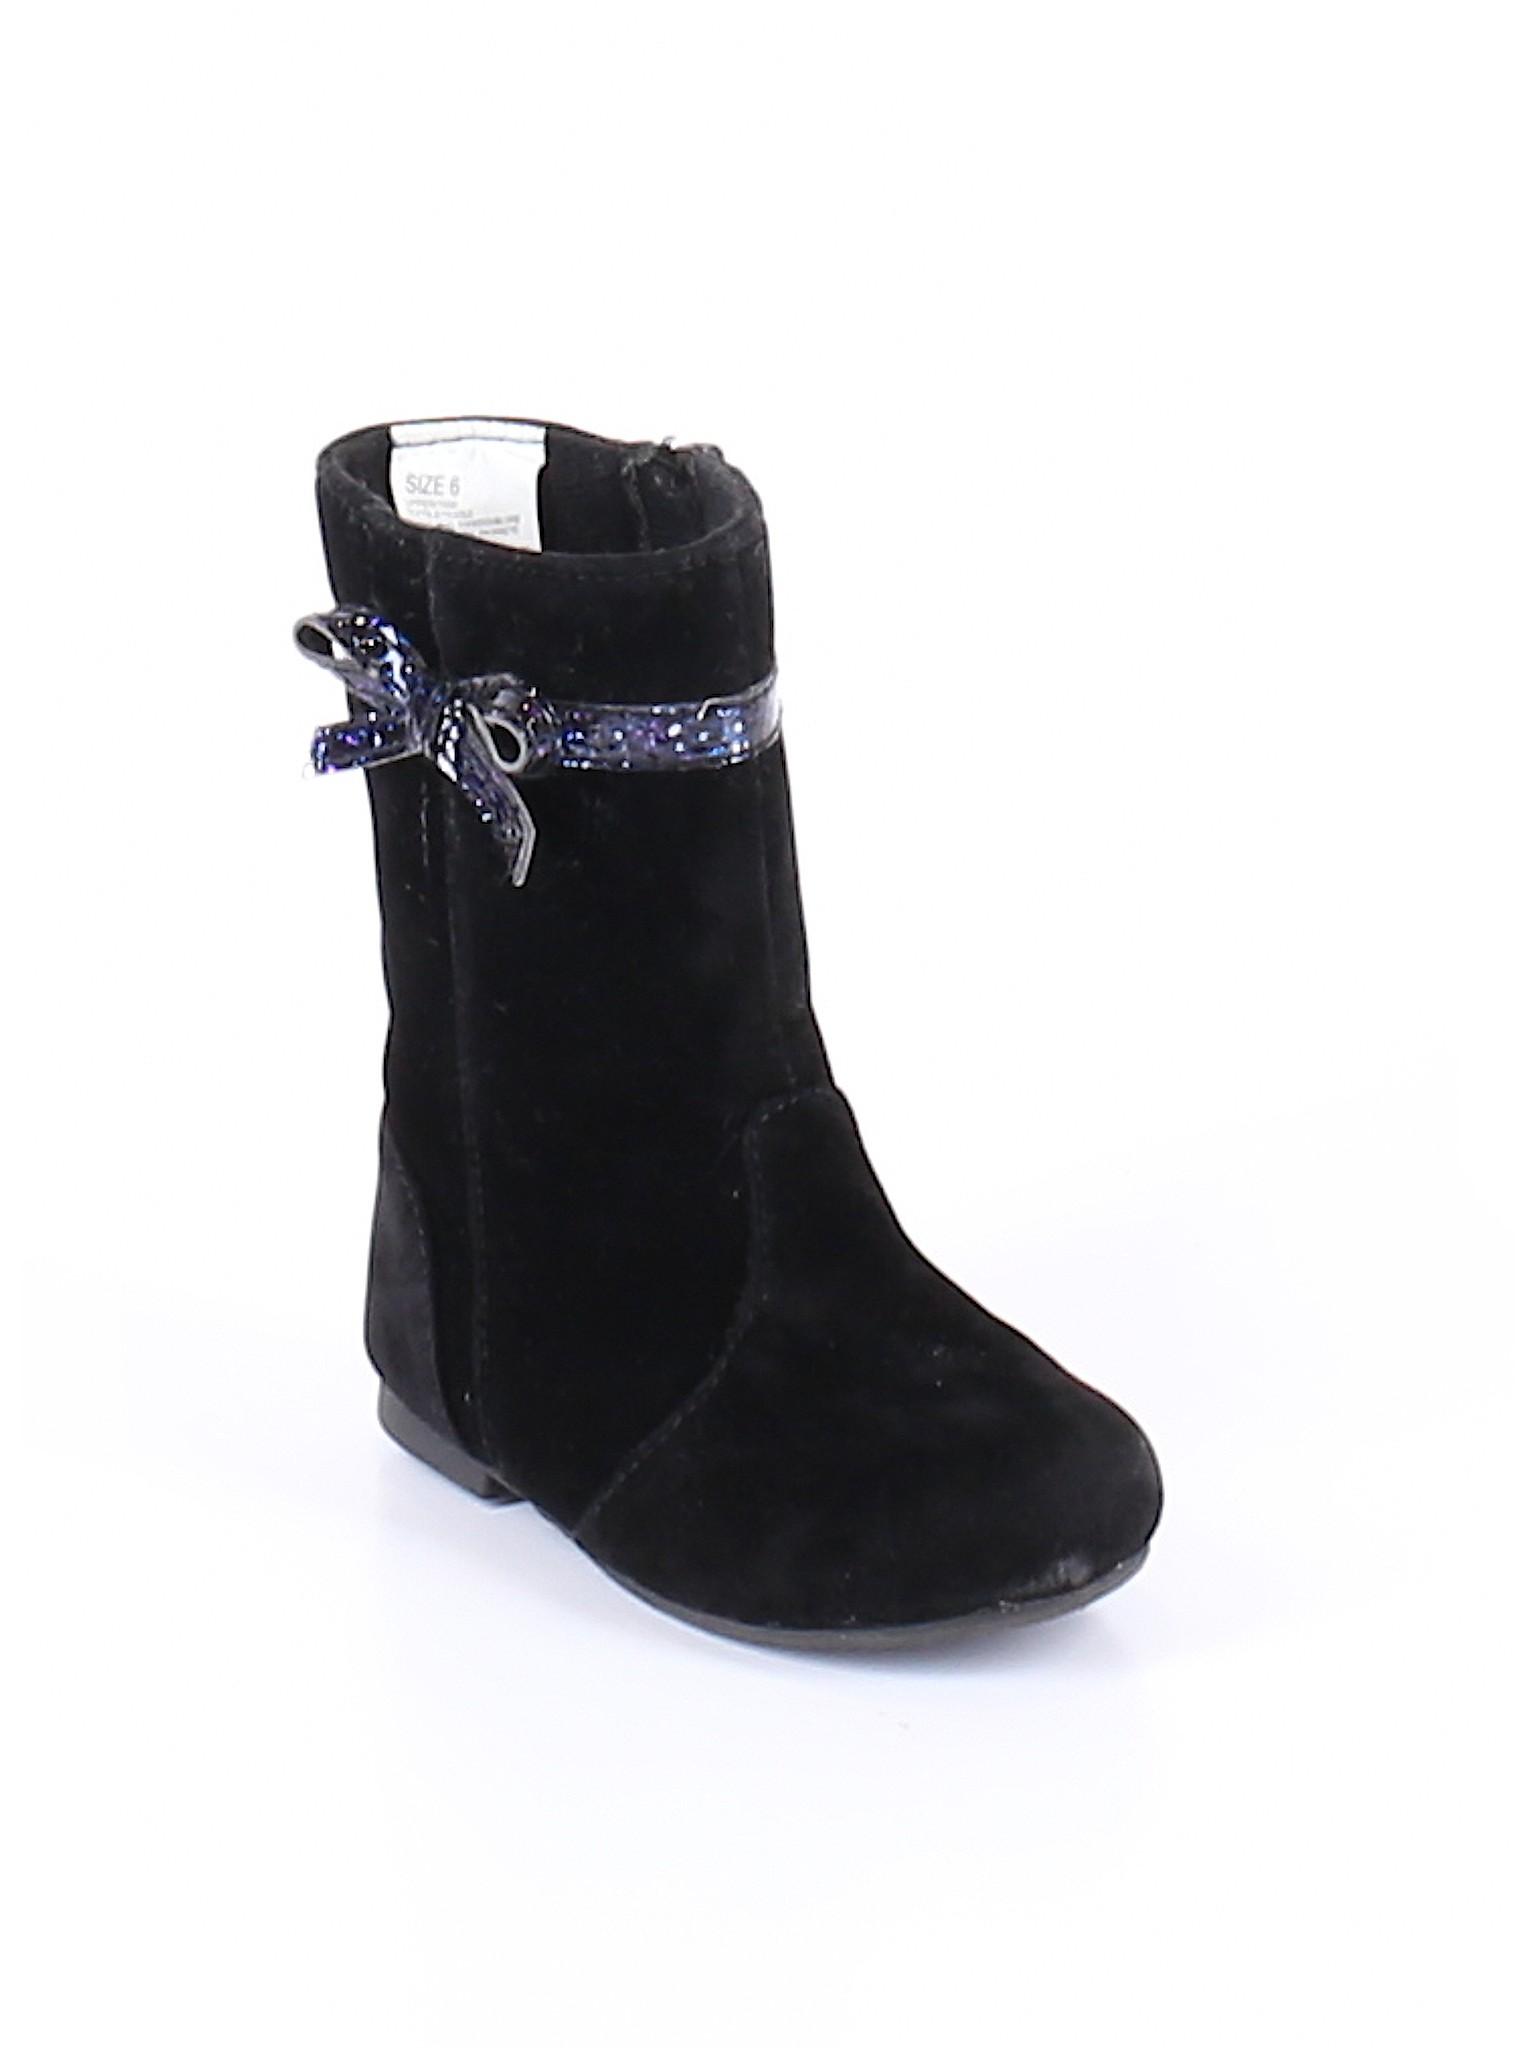 Gymboree Solid Black Boots Size 6 77 Off Thredup